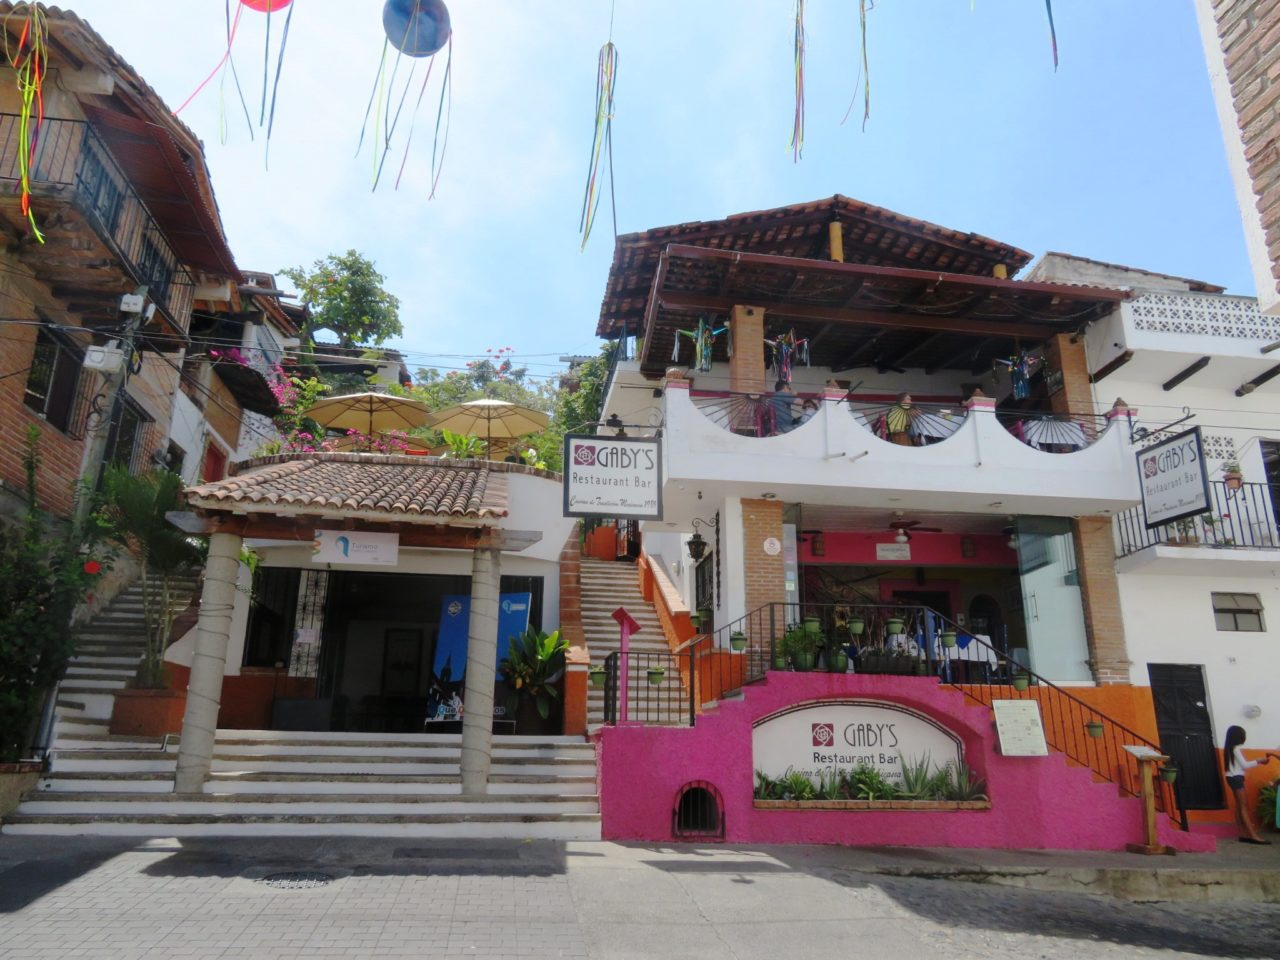 Puerto Vallarta Favorite Experiences : Gaby's Restaurant and Bar